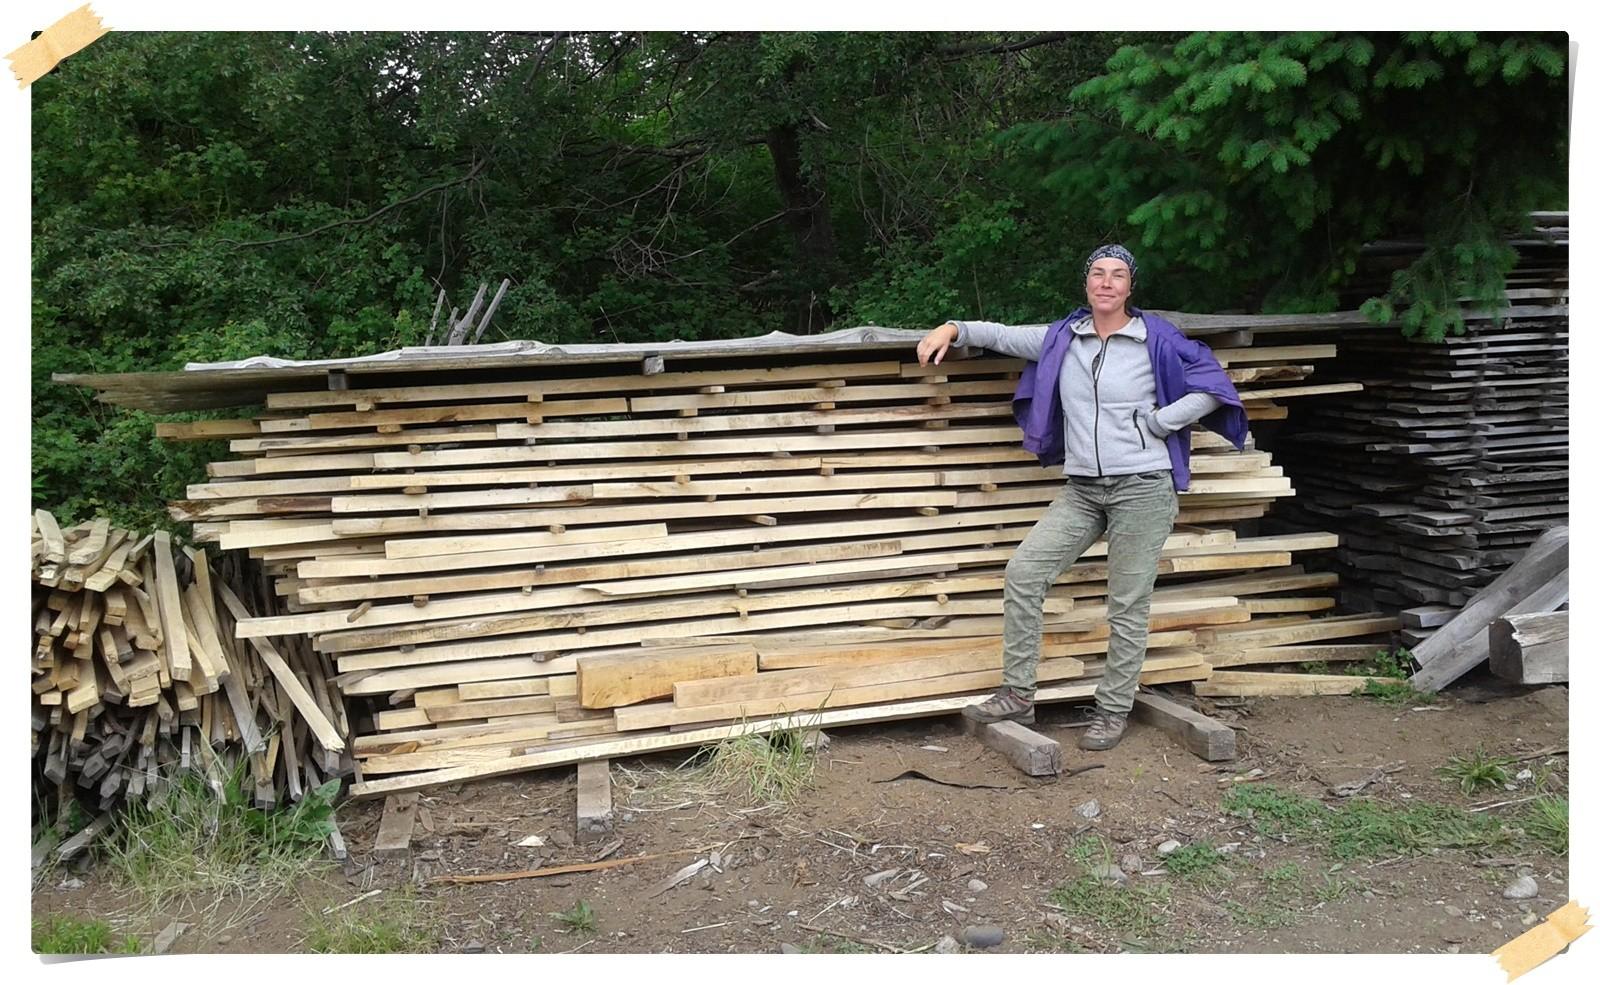 das Holz stapeln